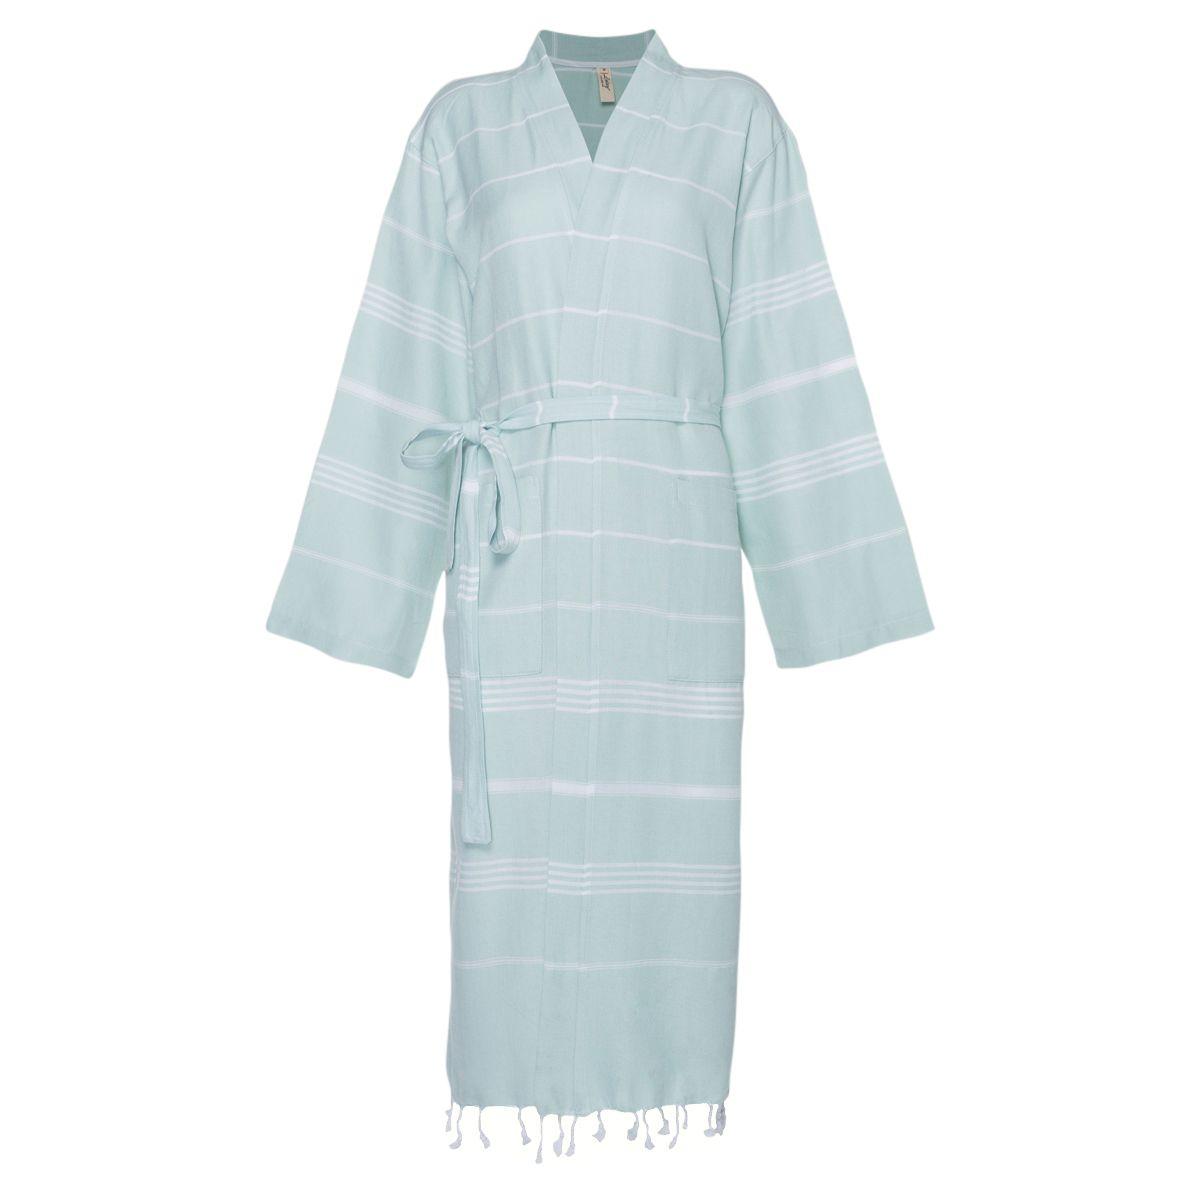 Bornoz Leyla / Kimono Yaka - Mint